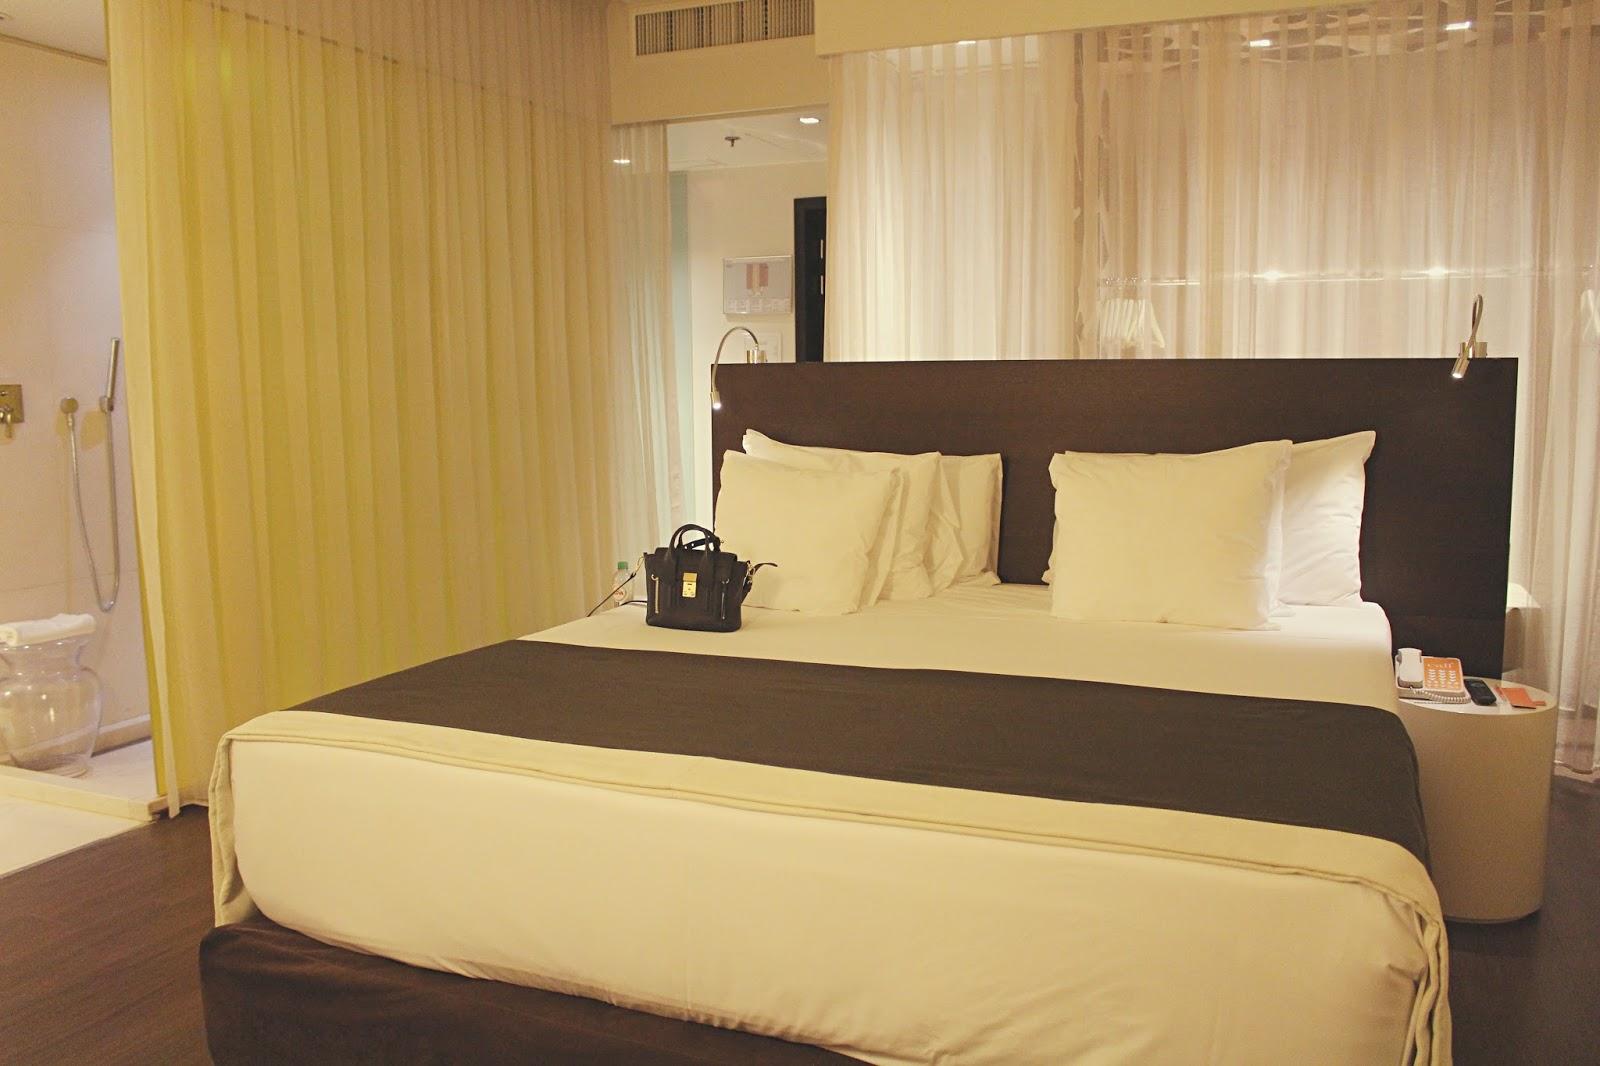 Hotel Nhow Milan X Costa Croisires Blog Lifestyle Amp Voyages